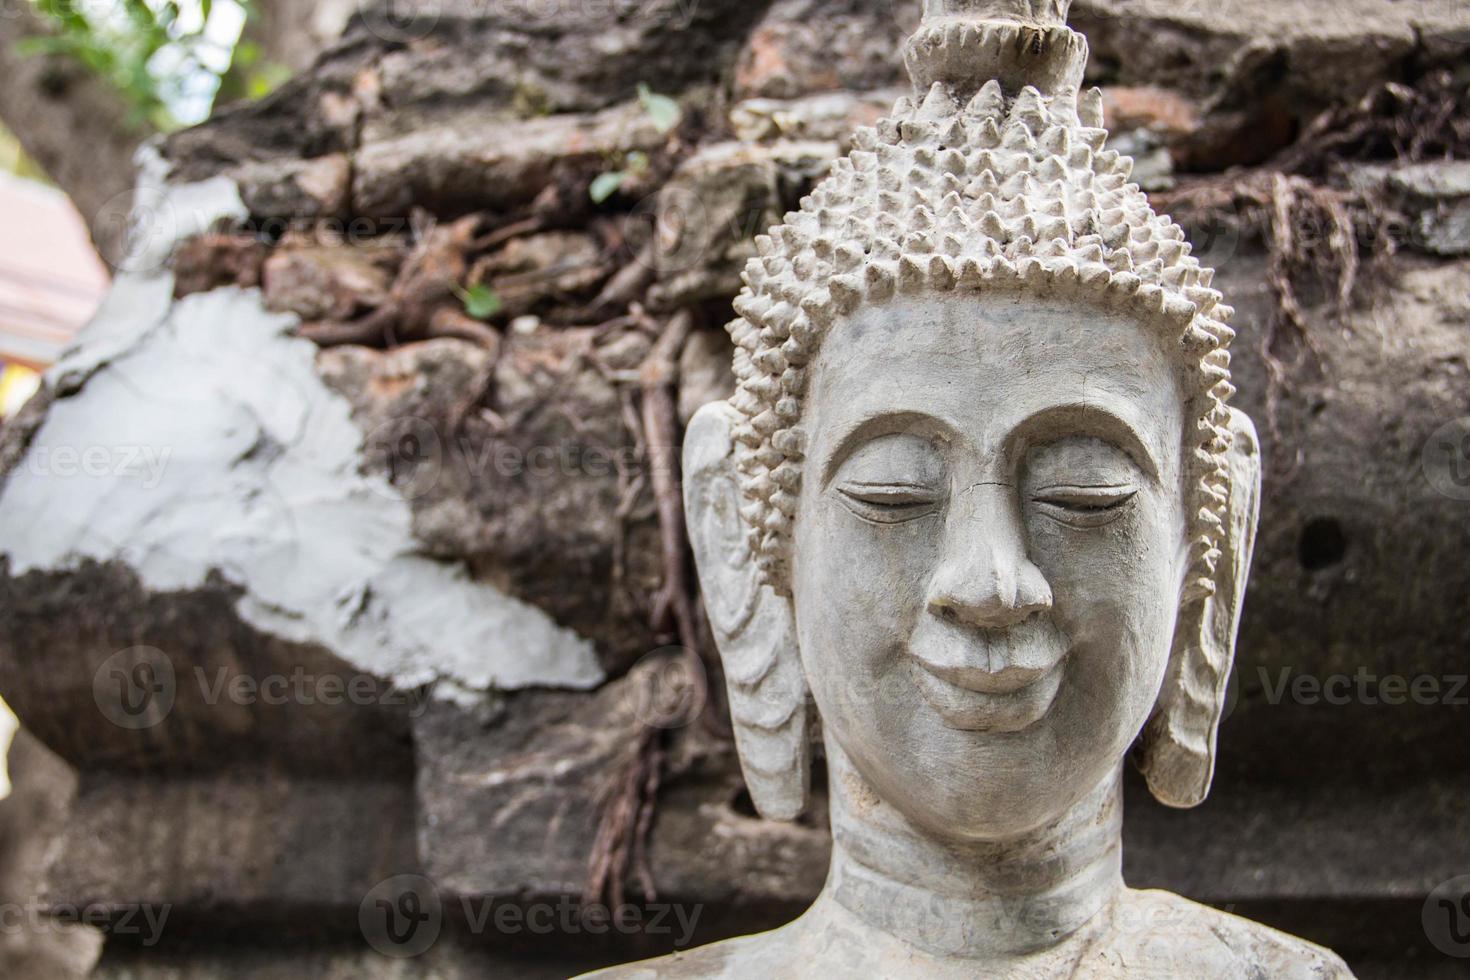 Cerrar la cabeza de Buda de estilo laos con fondo grunge foto